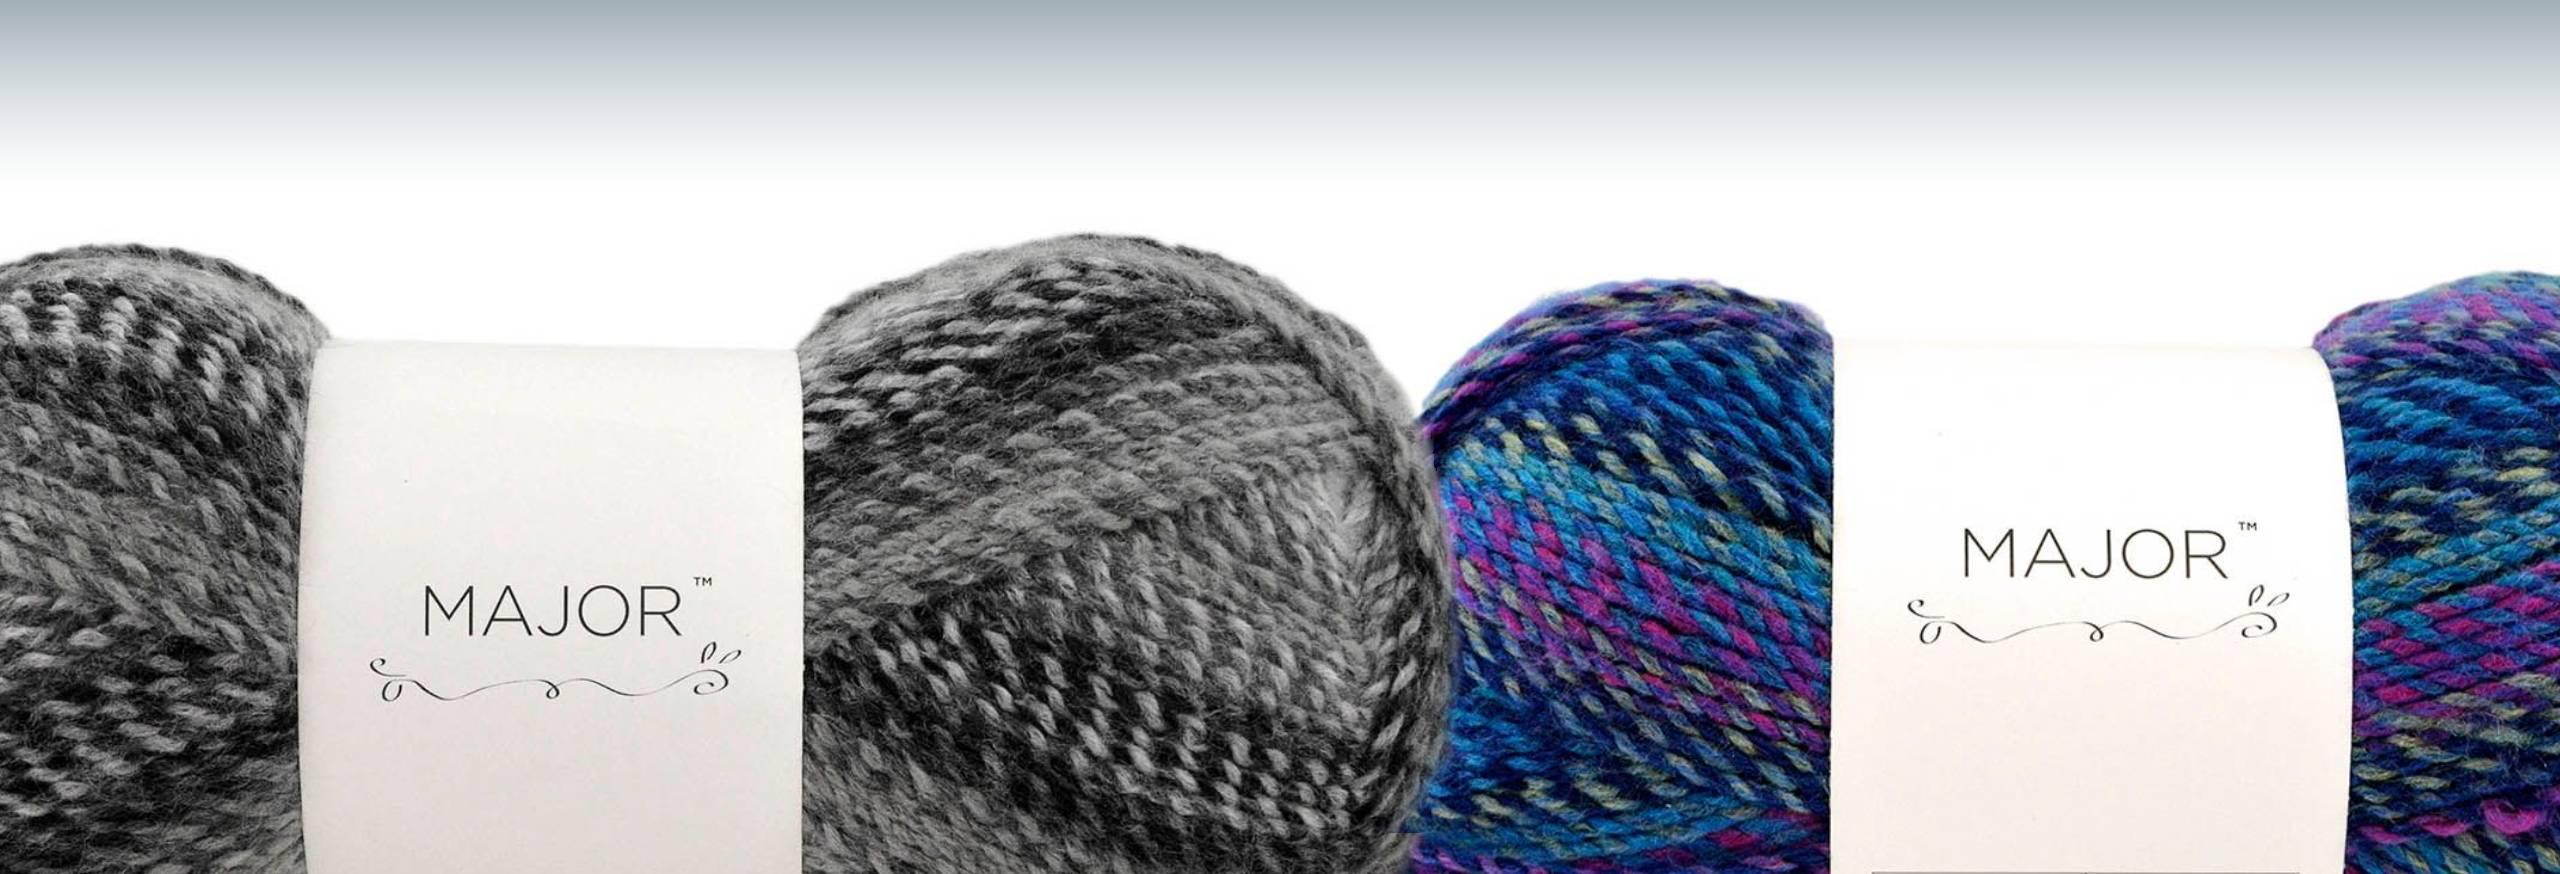 Universal Yarn's Major